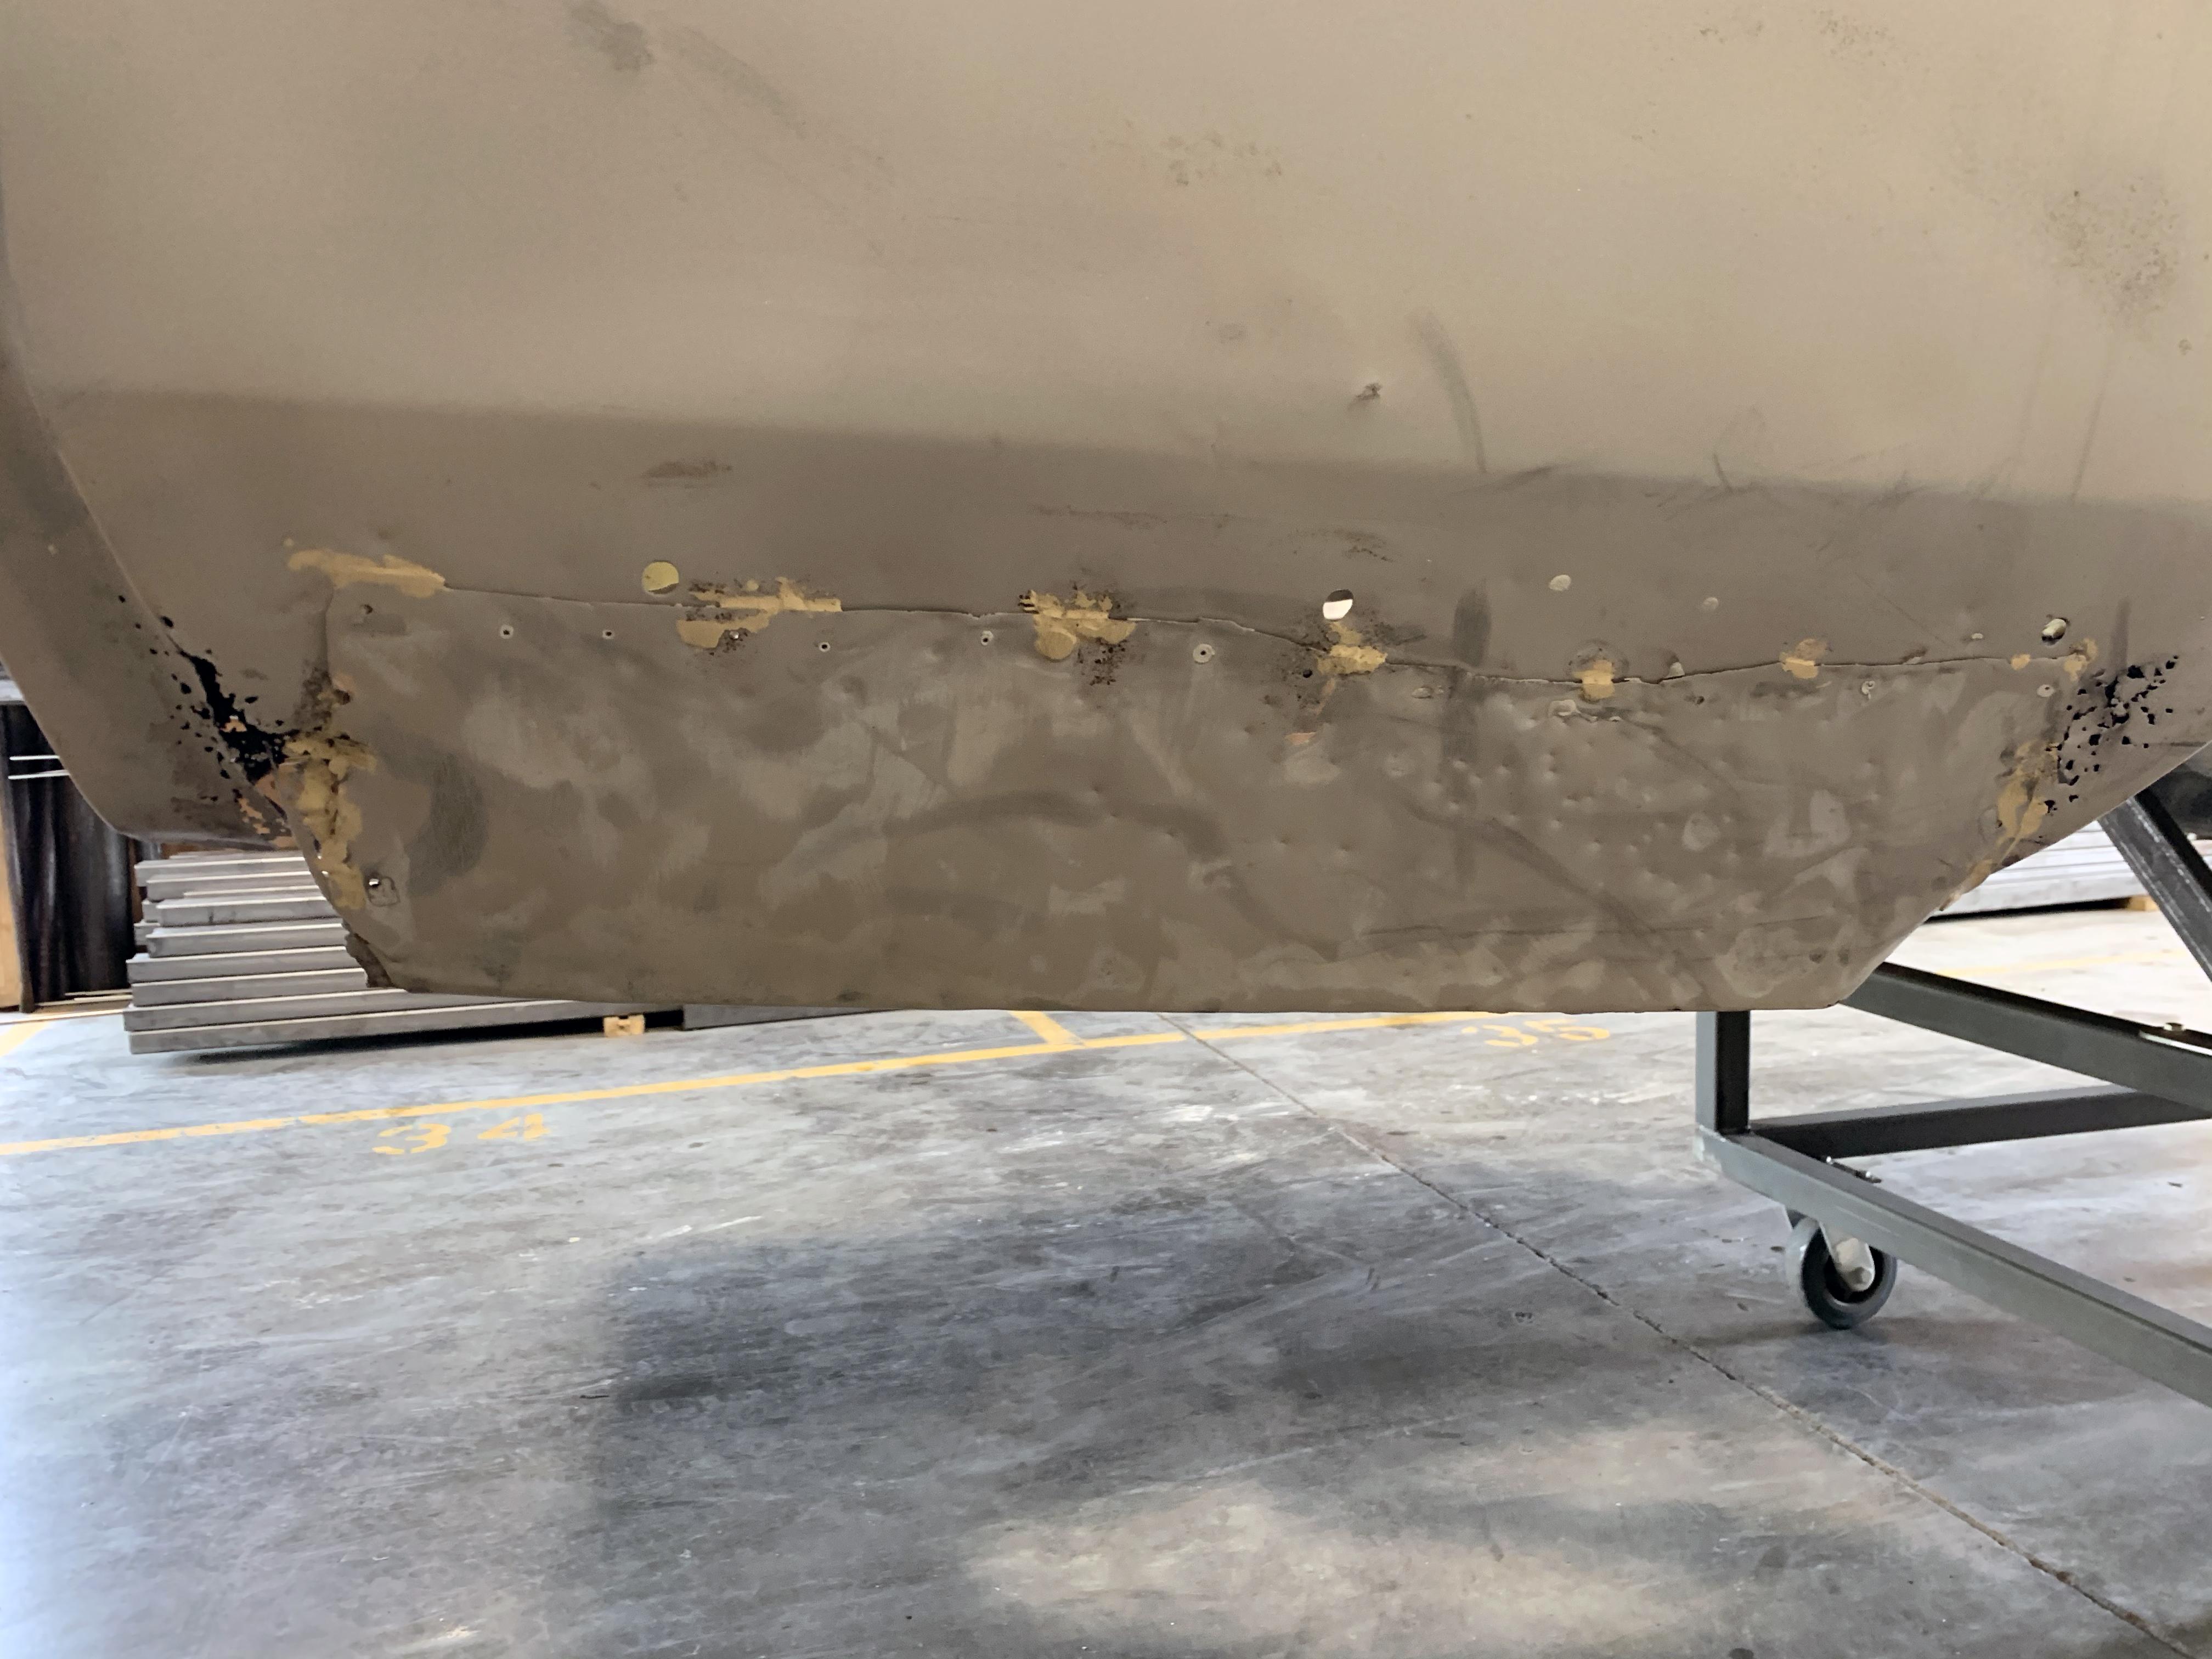 1_scotts-hotrods-65-cutlass-project-19